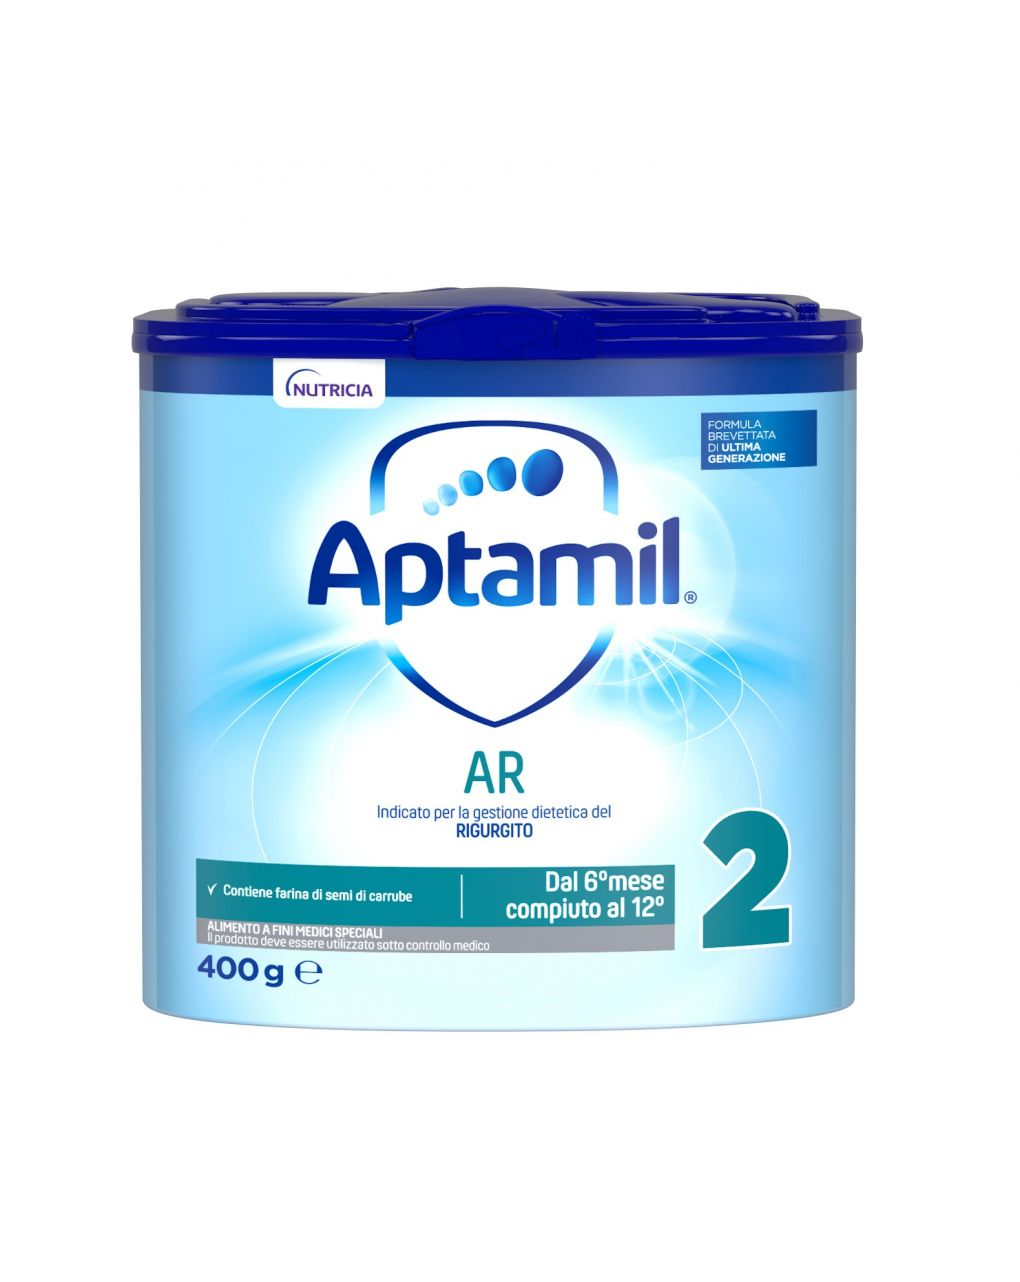 Aptamil - latte aptamil ar 2 polvere 400g - Aptamil